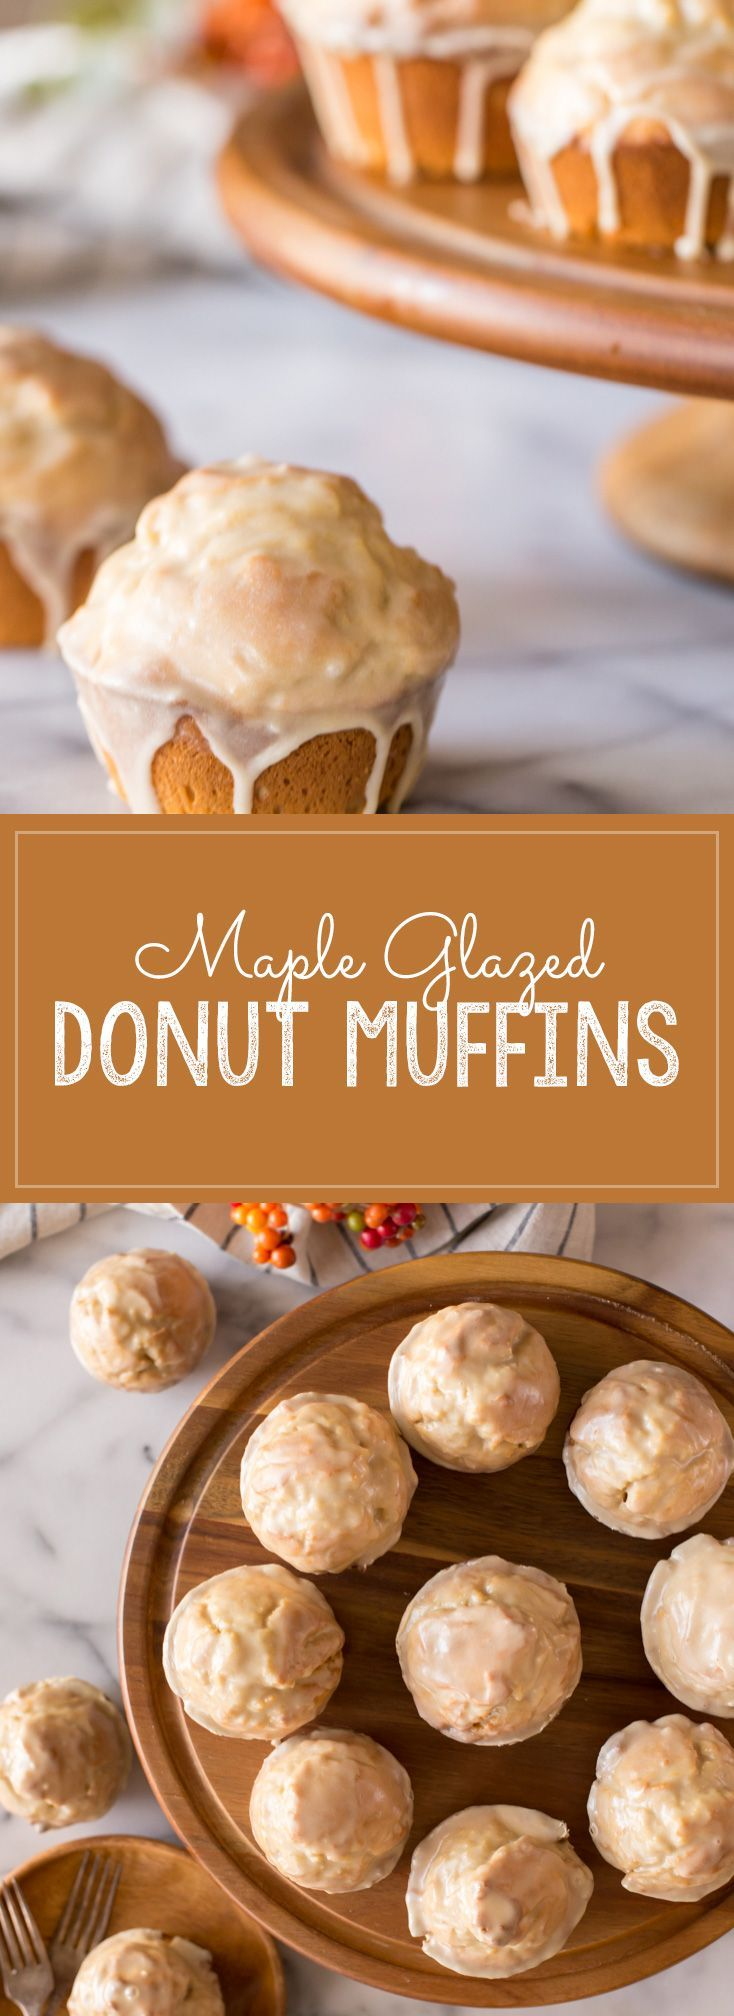 Maple cake donut recipe